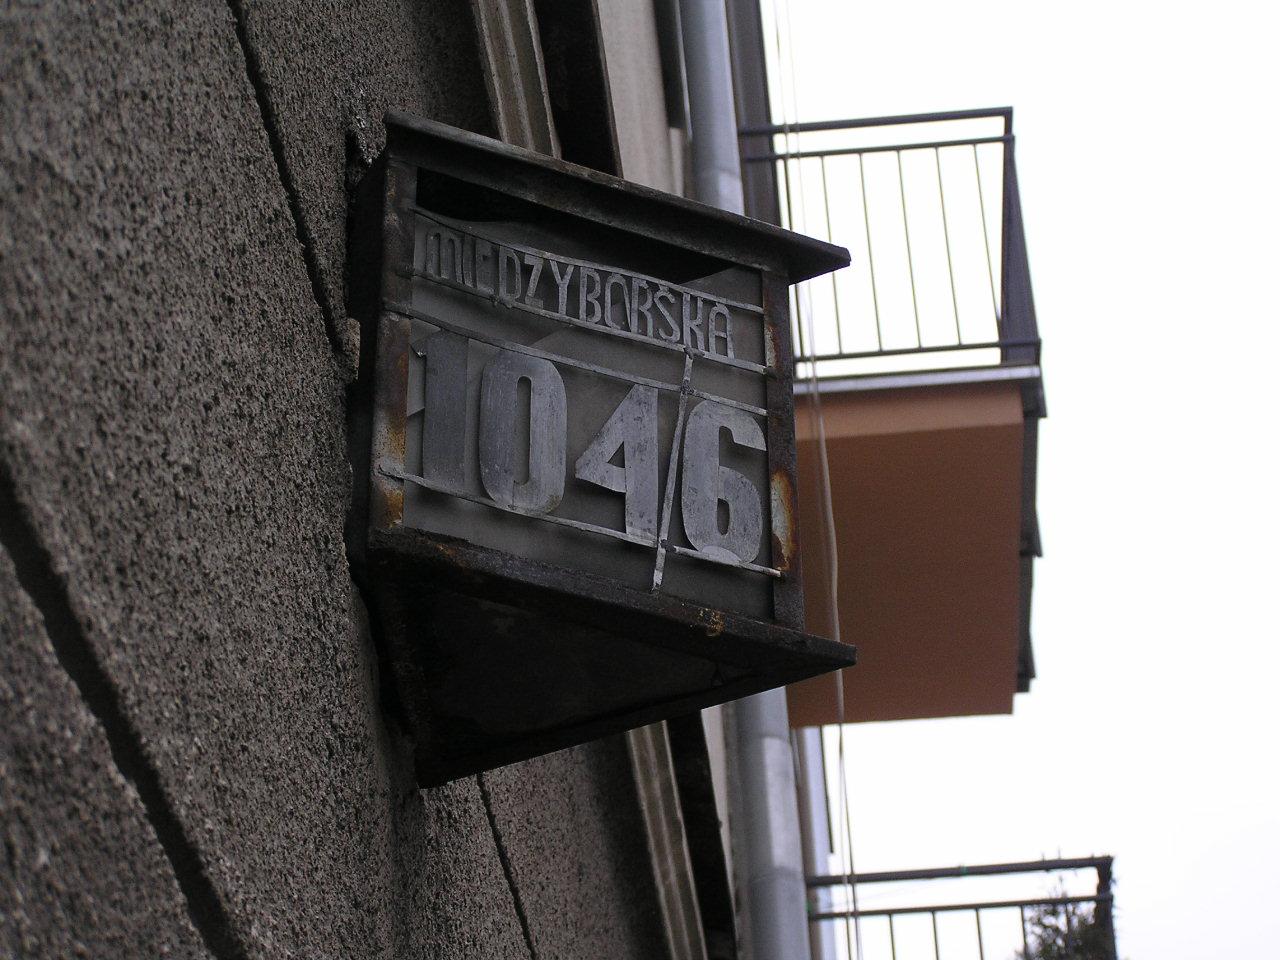 Latarenka adresowa - Międzyborska 104/106